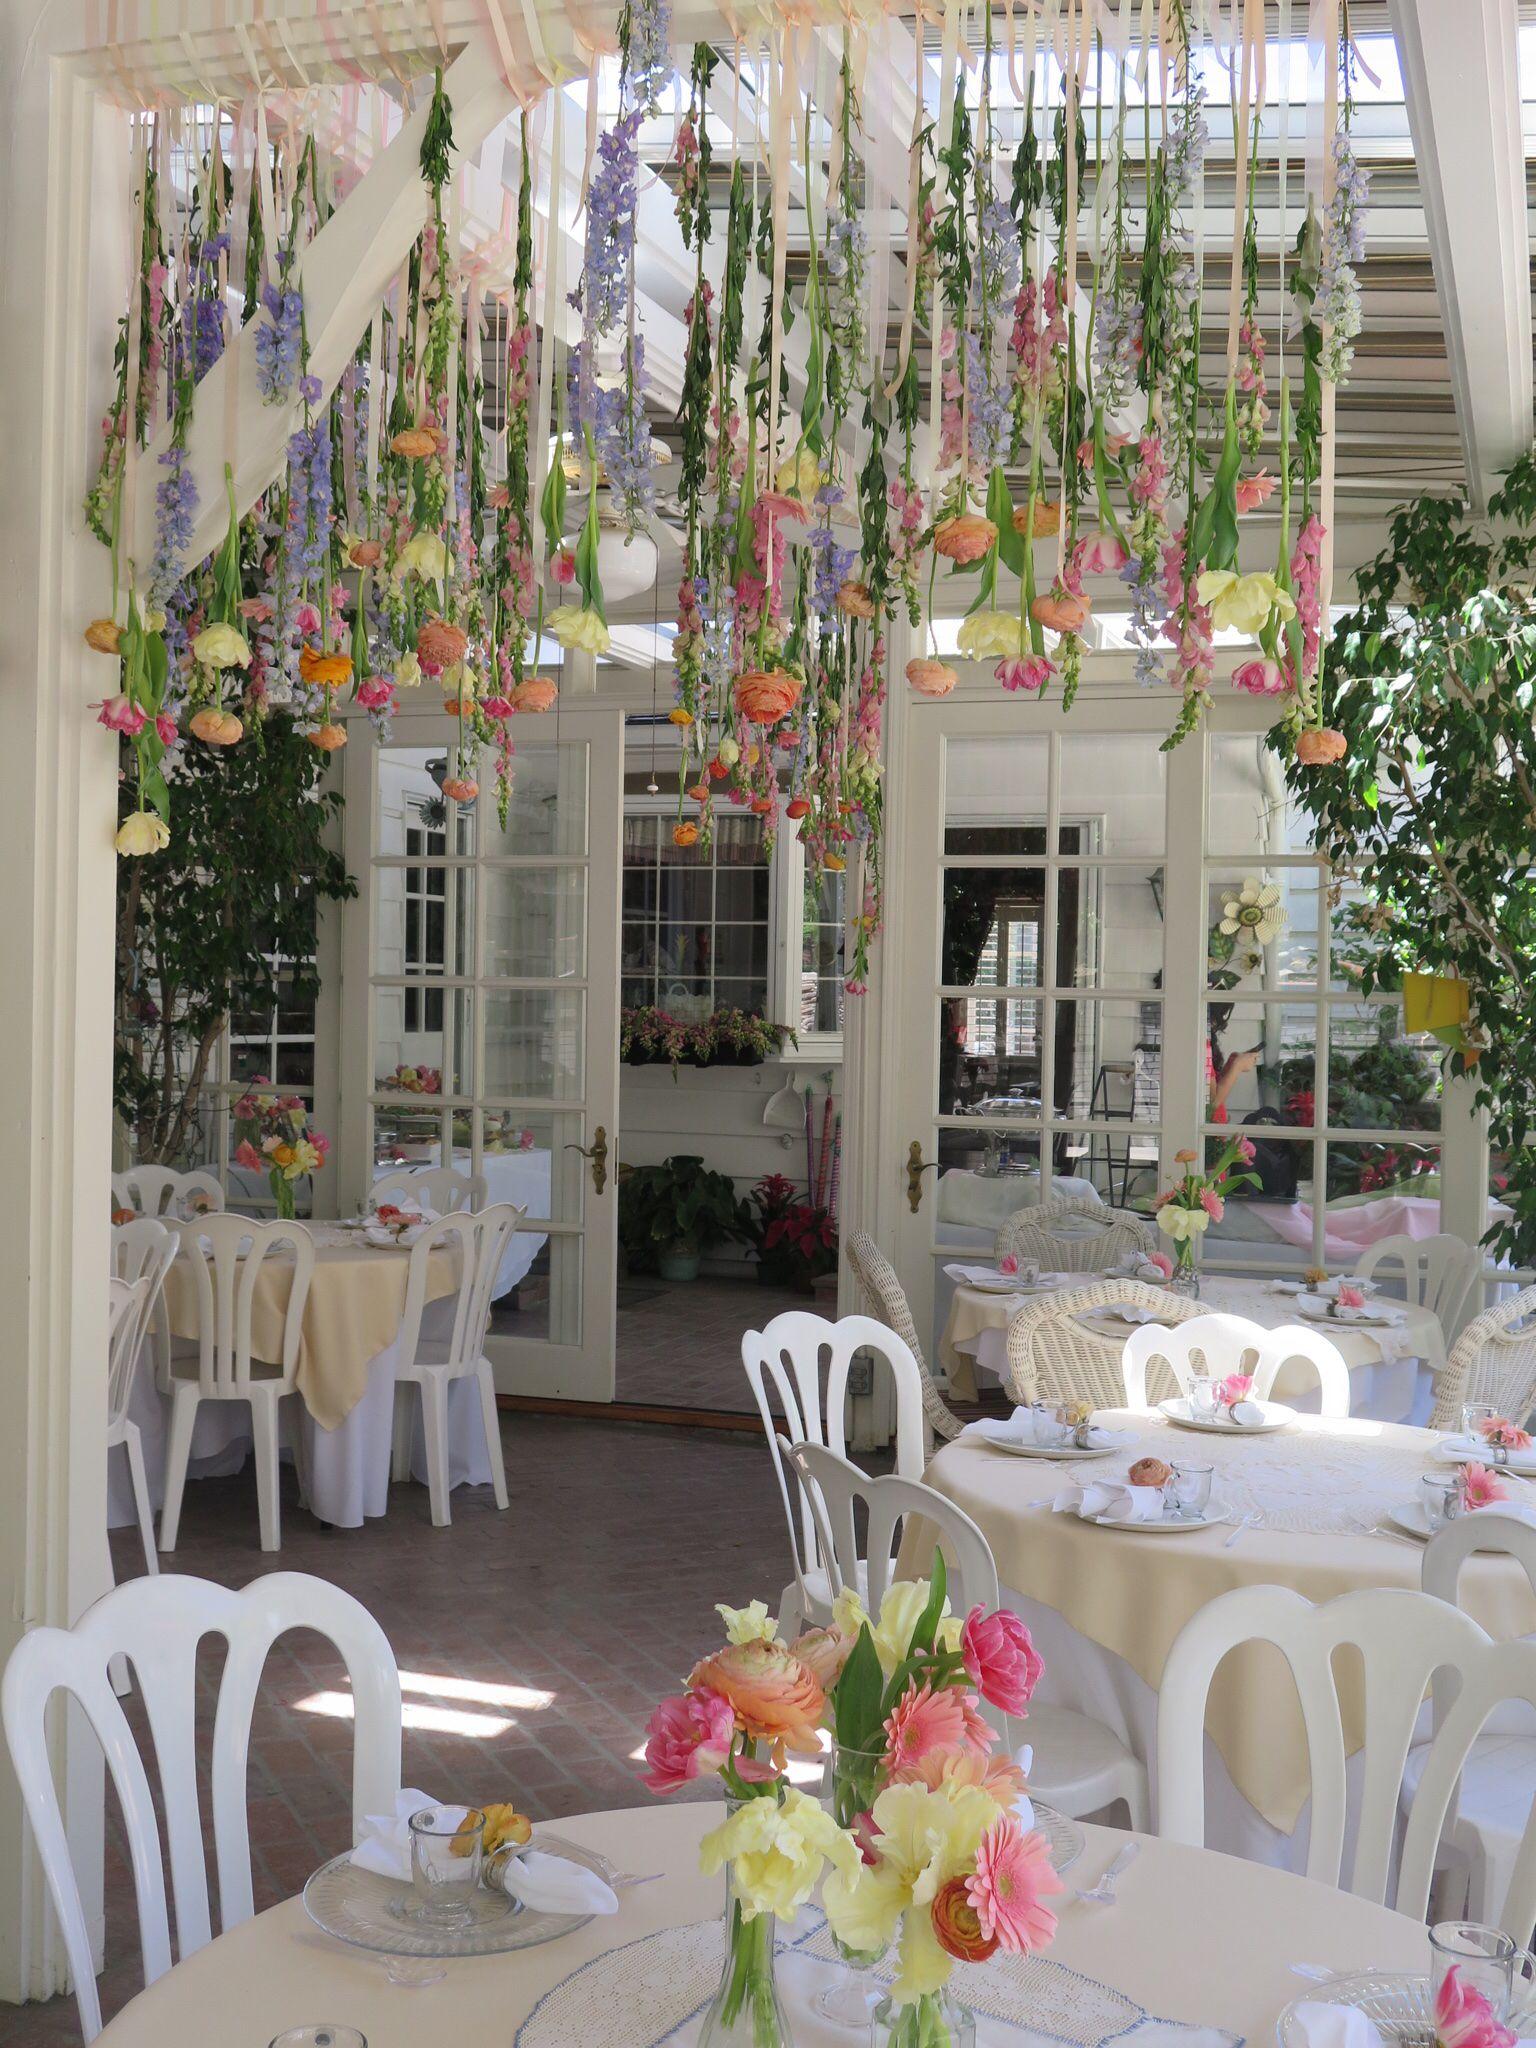 Bridal Shower Garden Theme Party Ideas